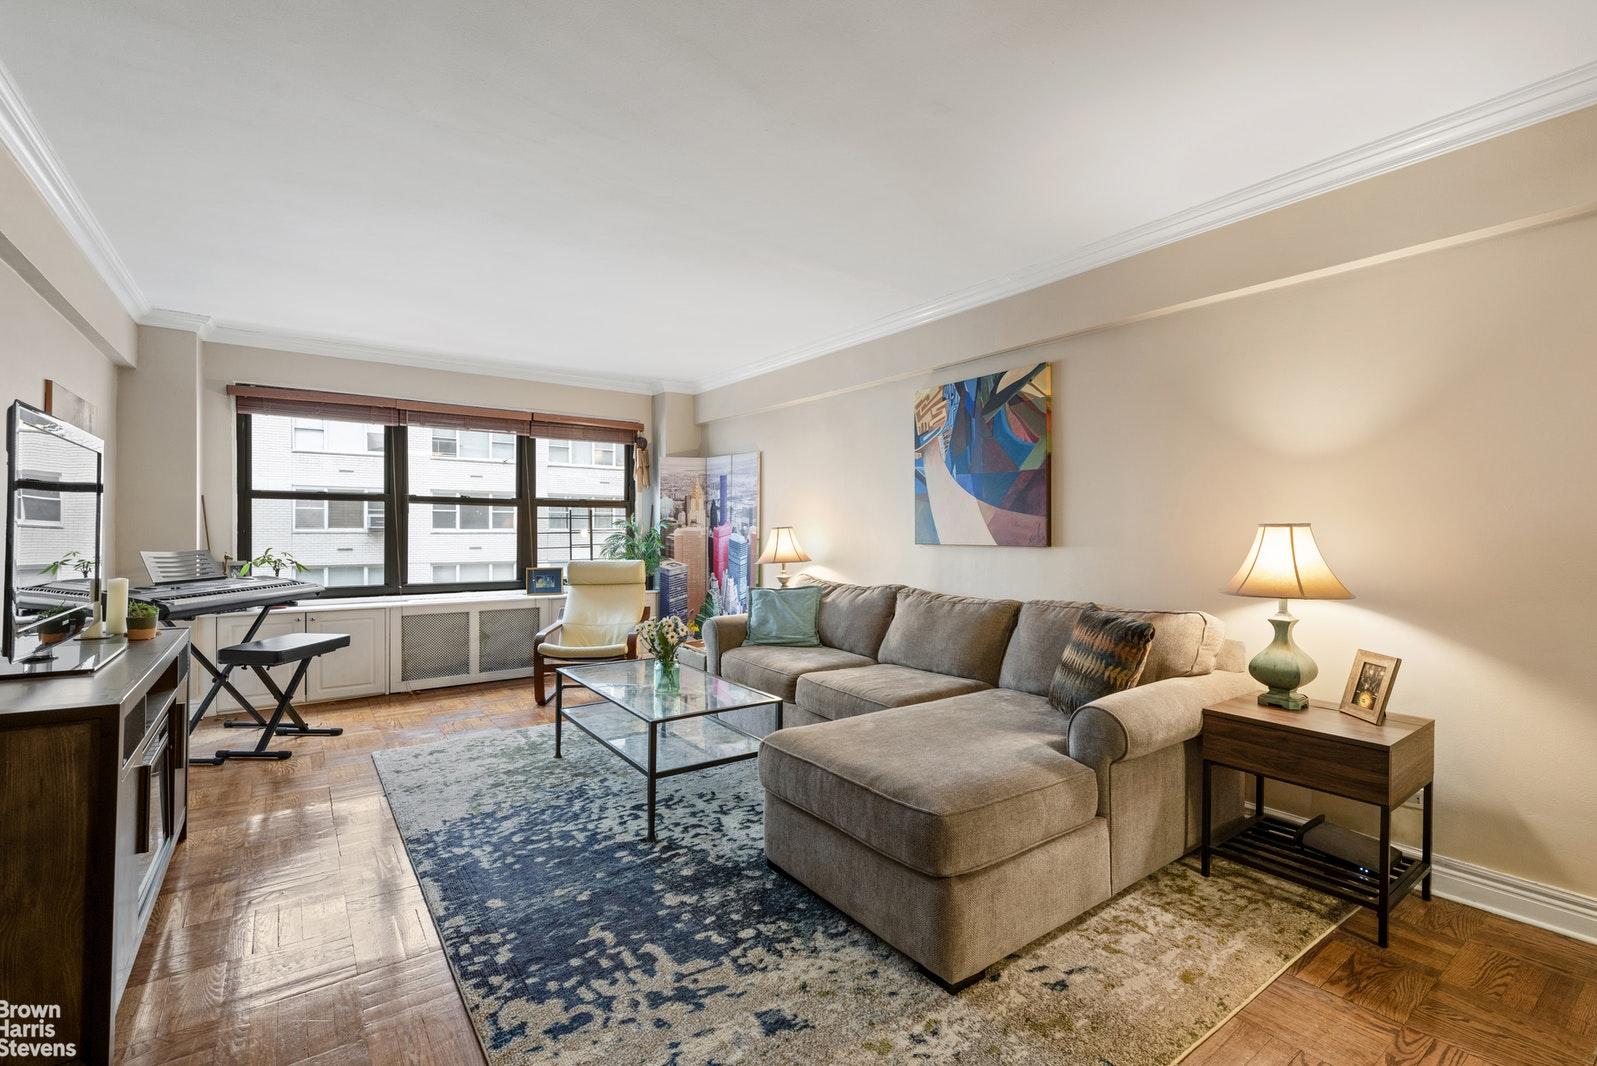 140 EAST 56TH STREET 4C, Midtown East, $1,150,000, Web #: 20676368